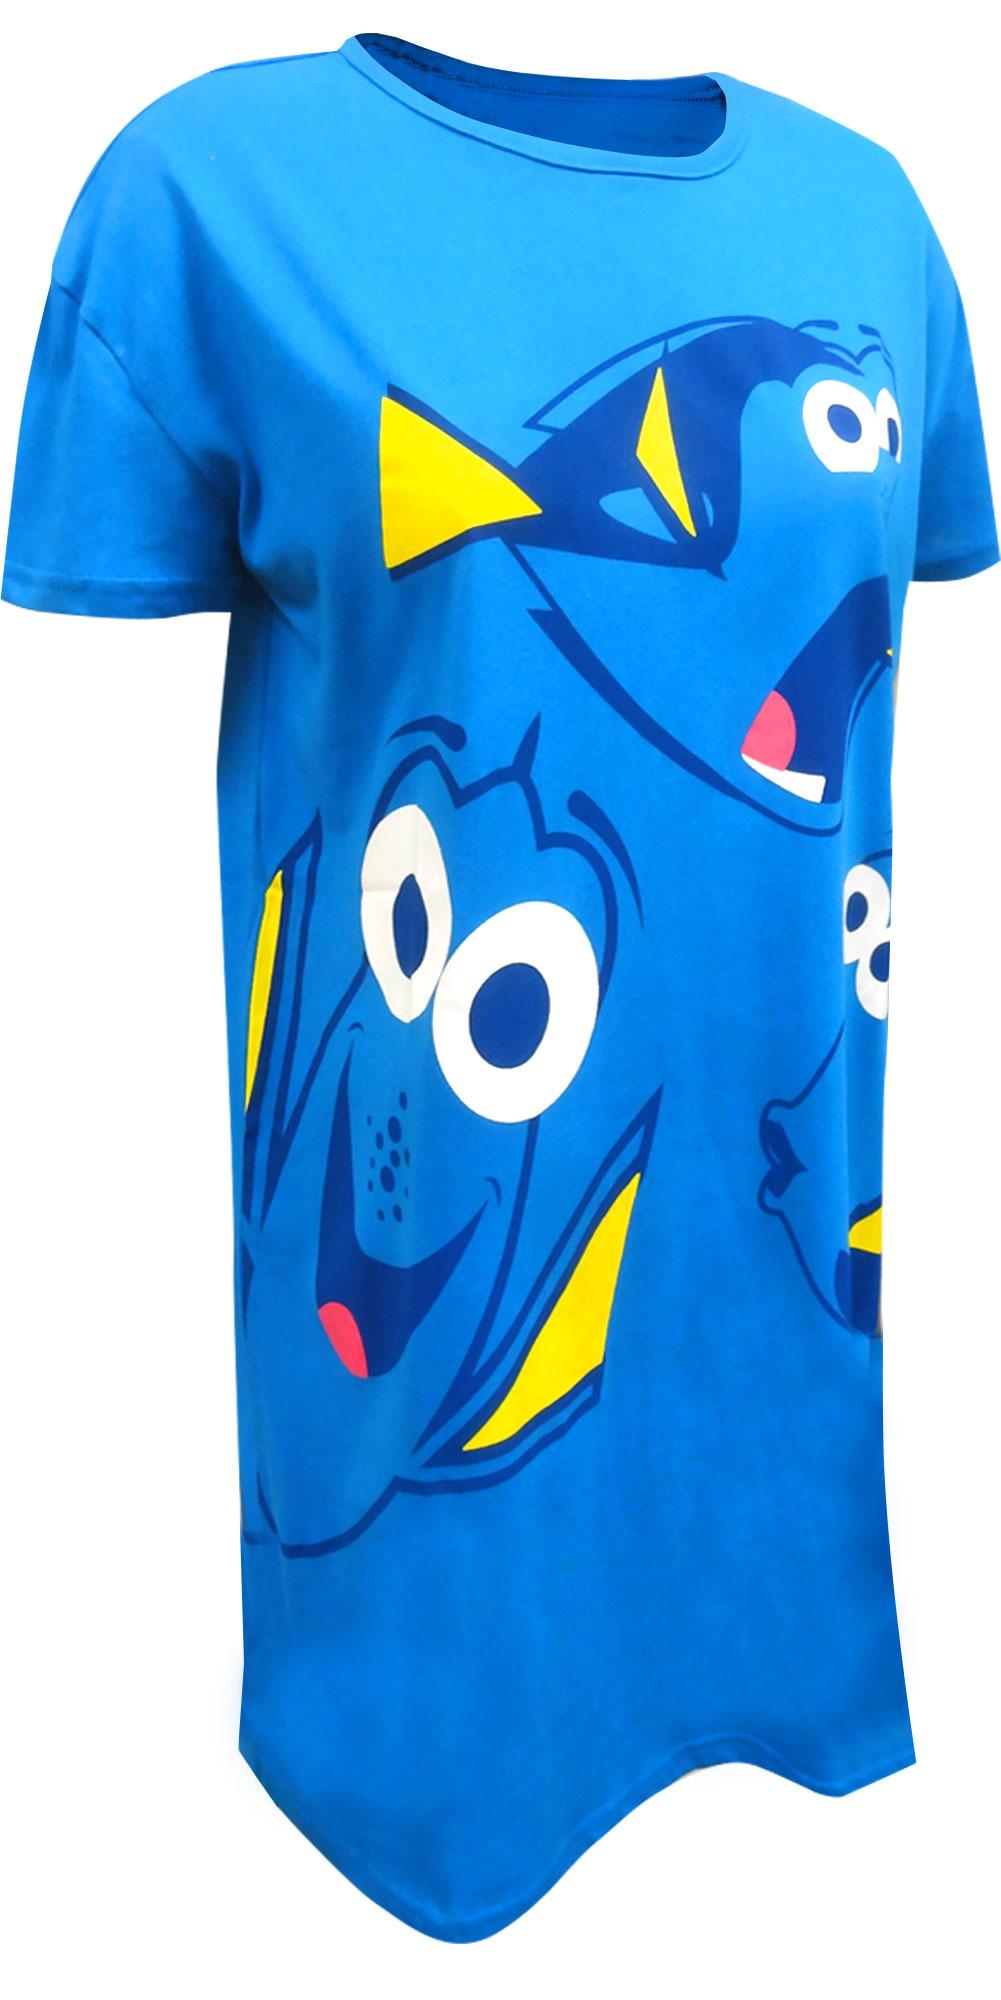 Image of Disney Pixar Finding Dory Night Shirt for women